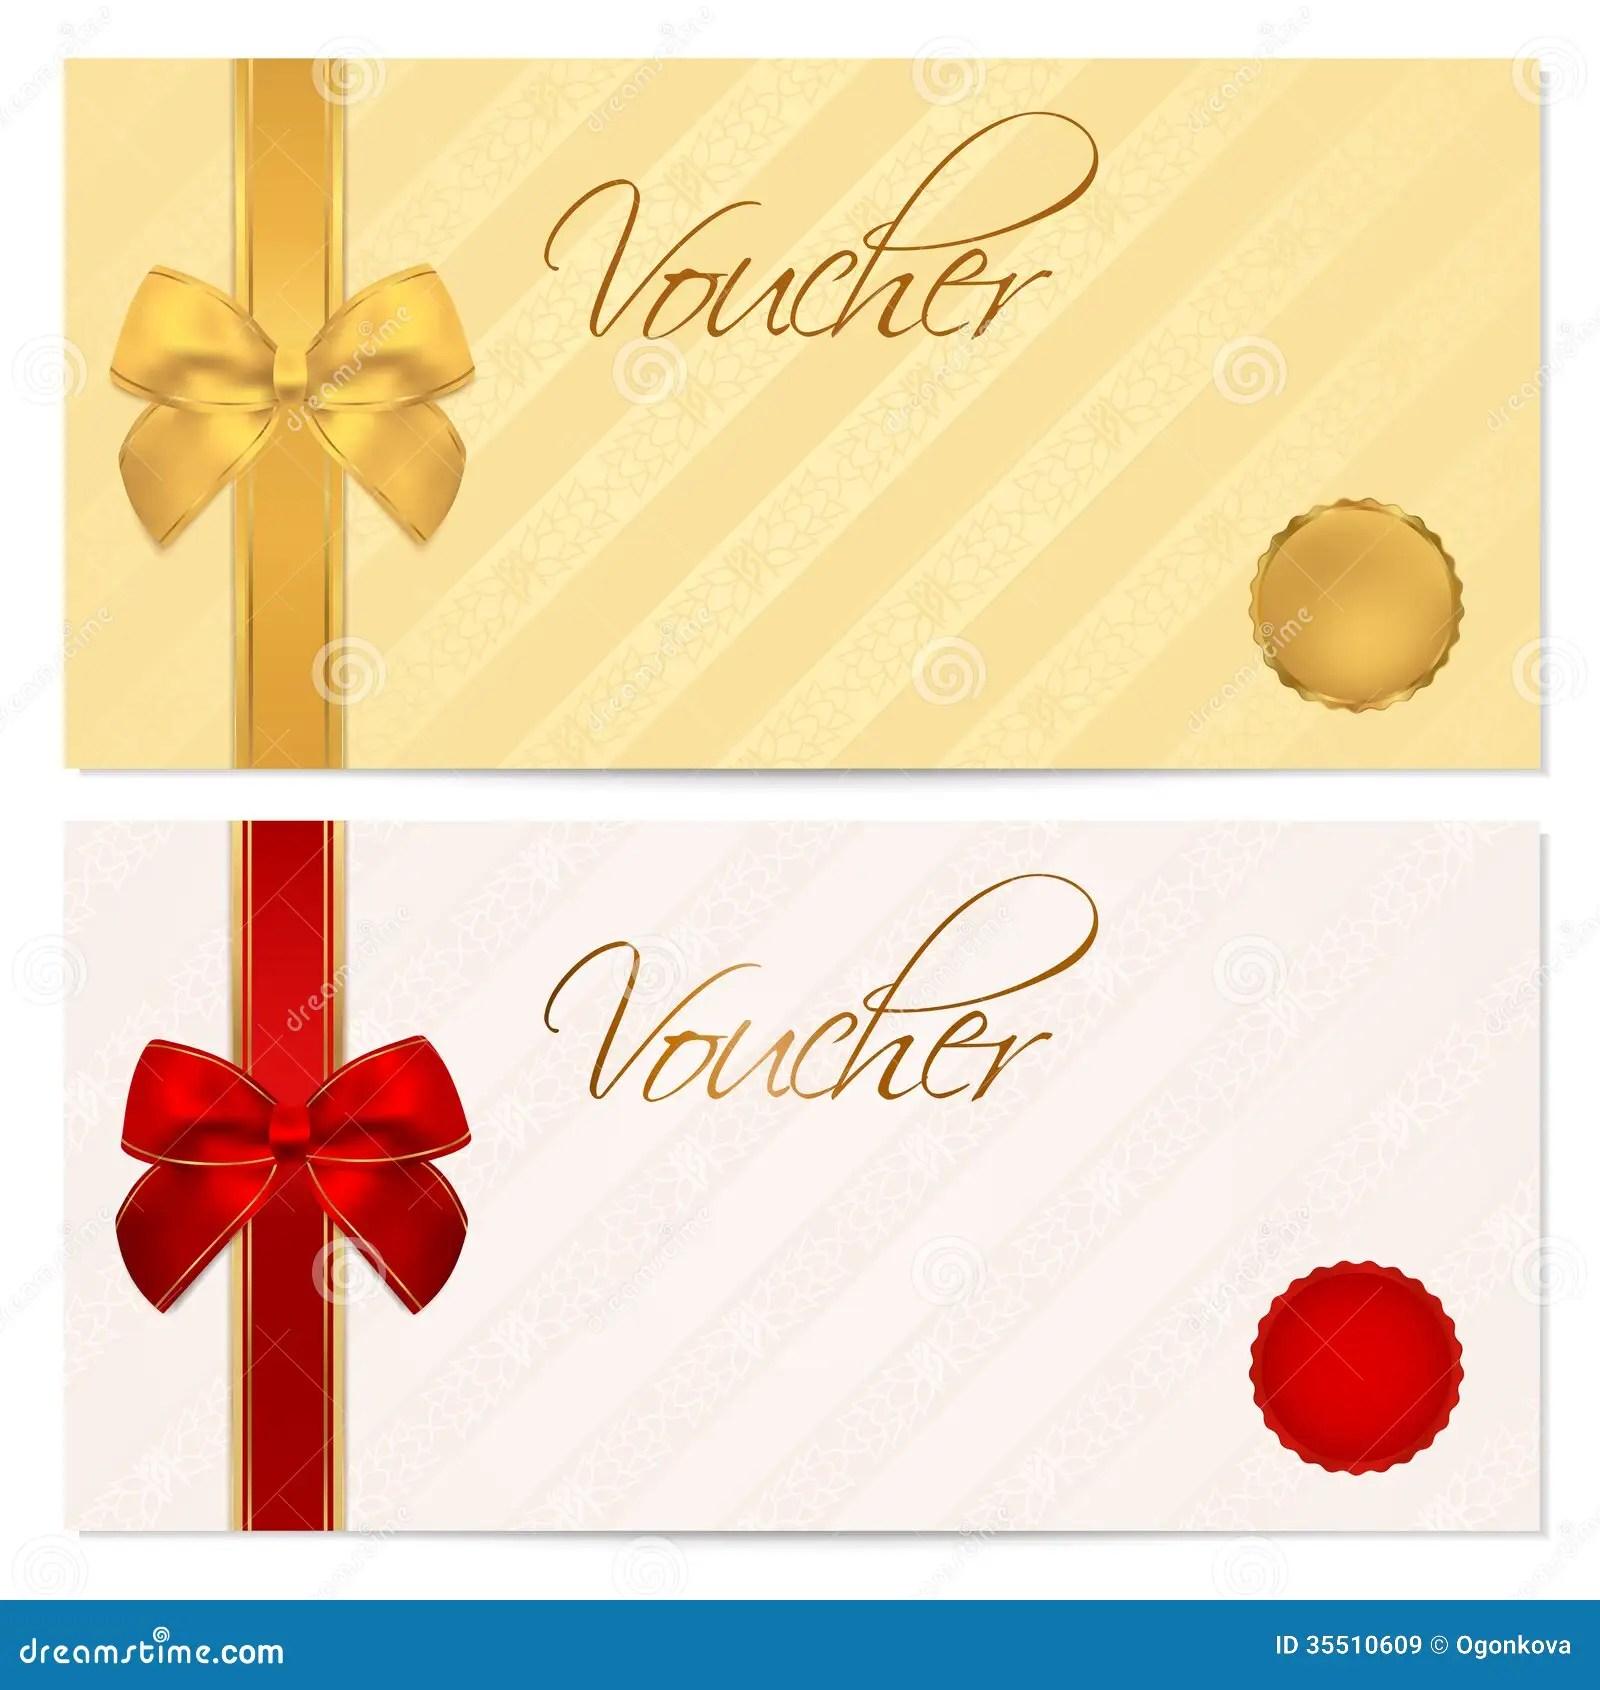 Doc629332 Create Voucher Recurring Payment Voucher REPV 90 – Money Voucher Template